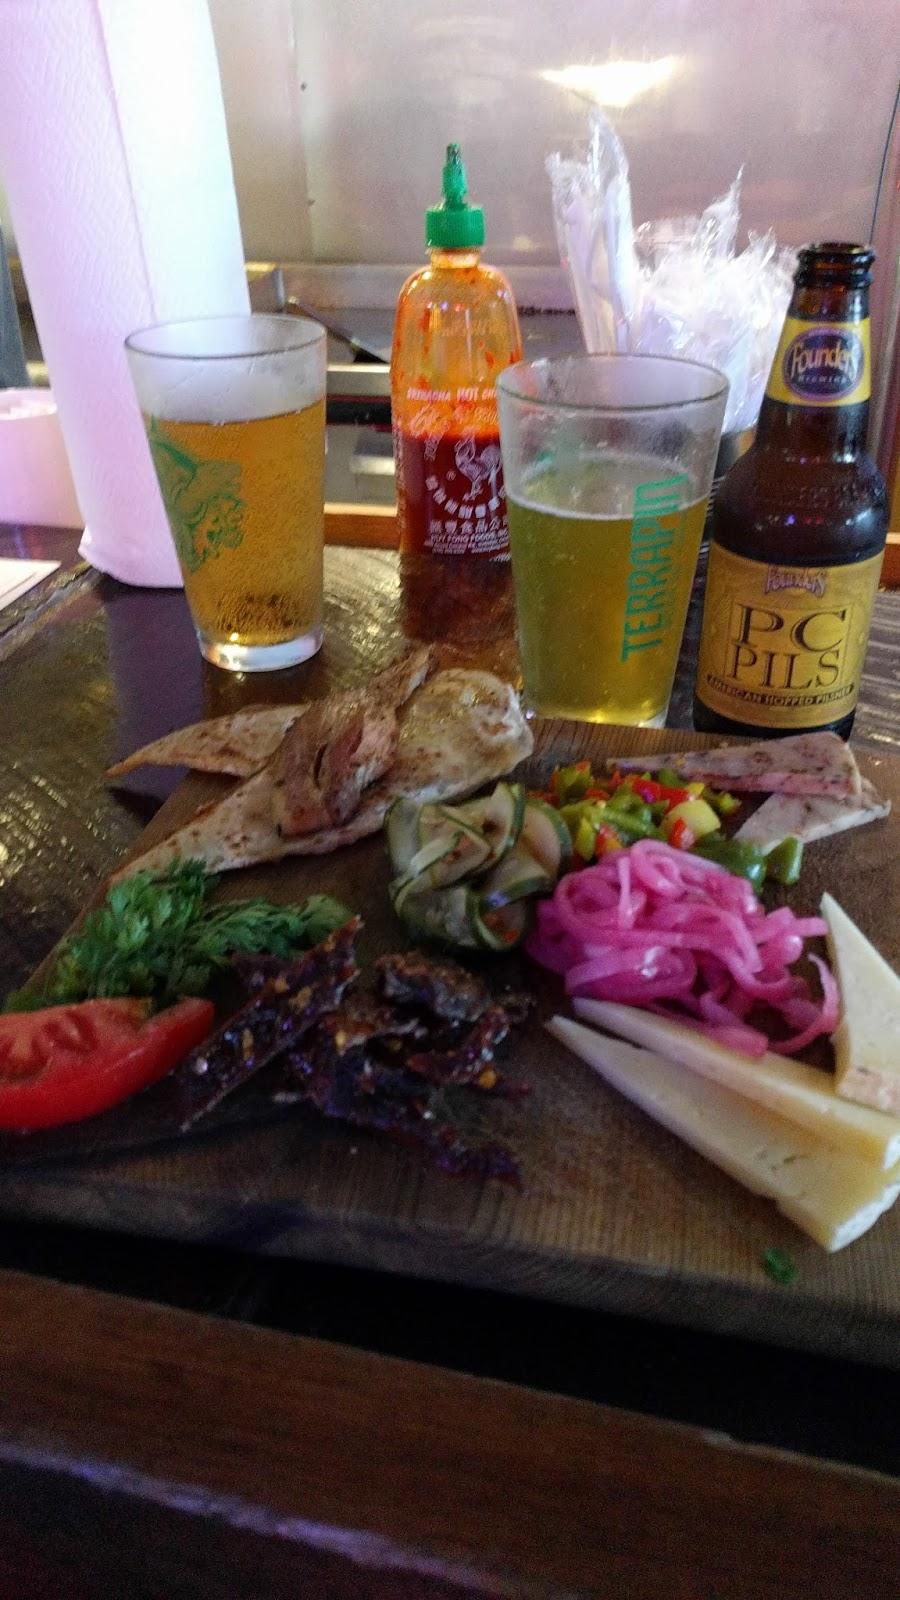 Neon Pig Cafe - Butcher Board